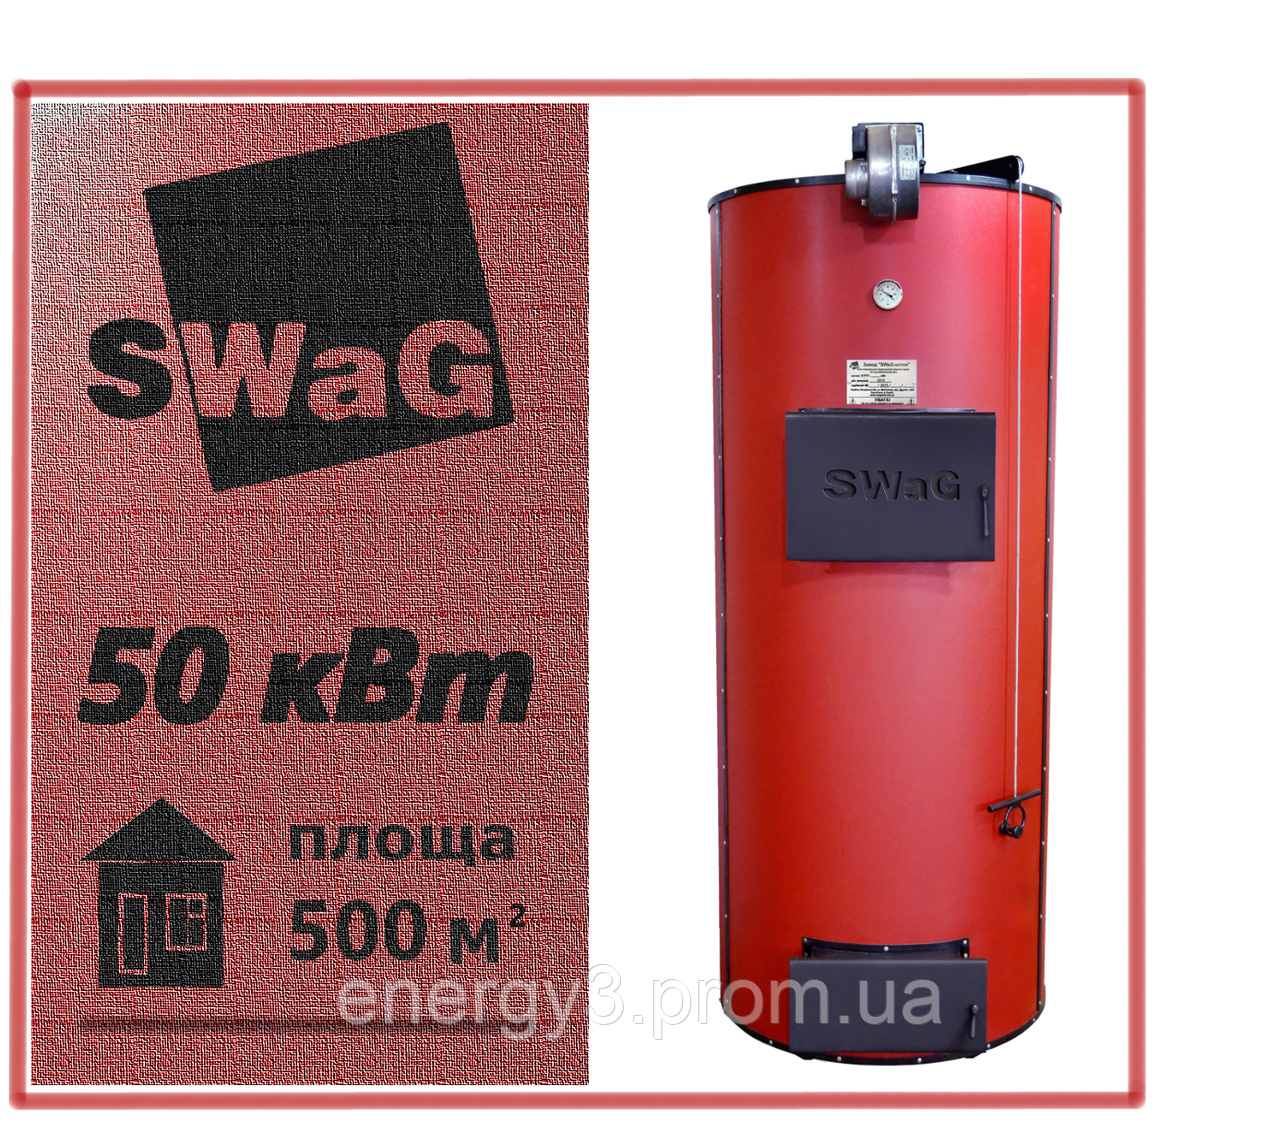 Котел SWAG 50D